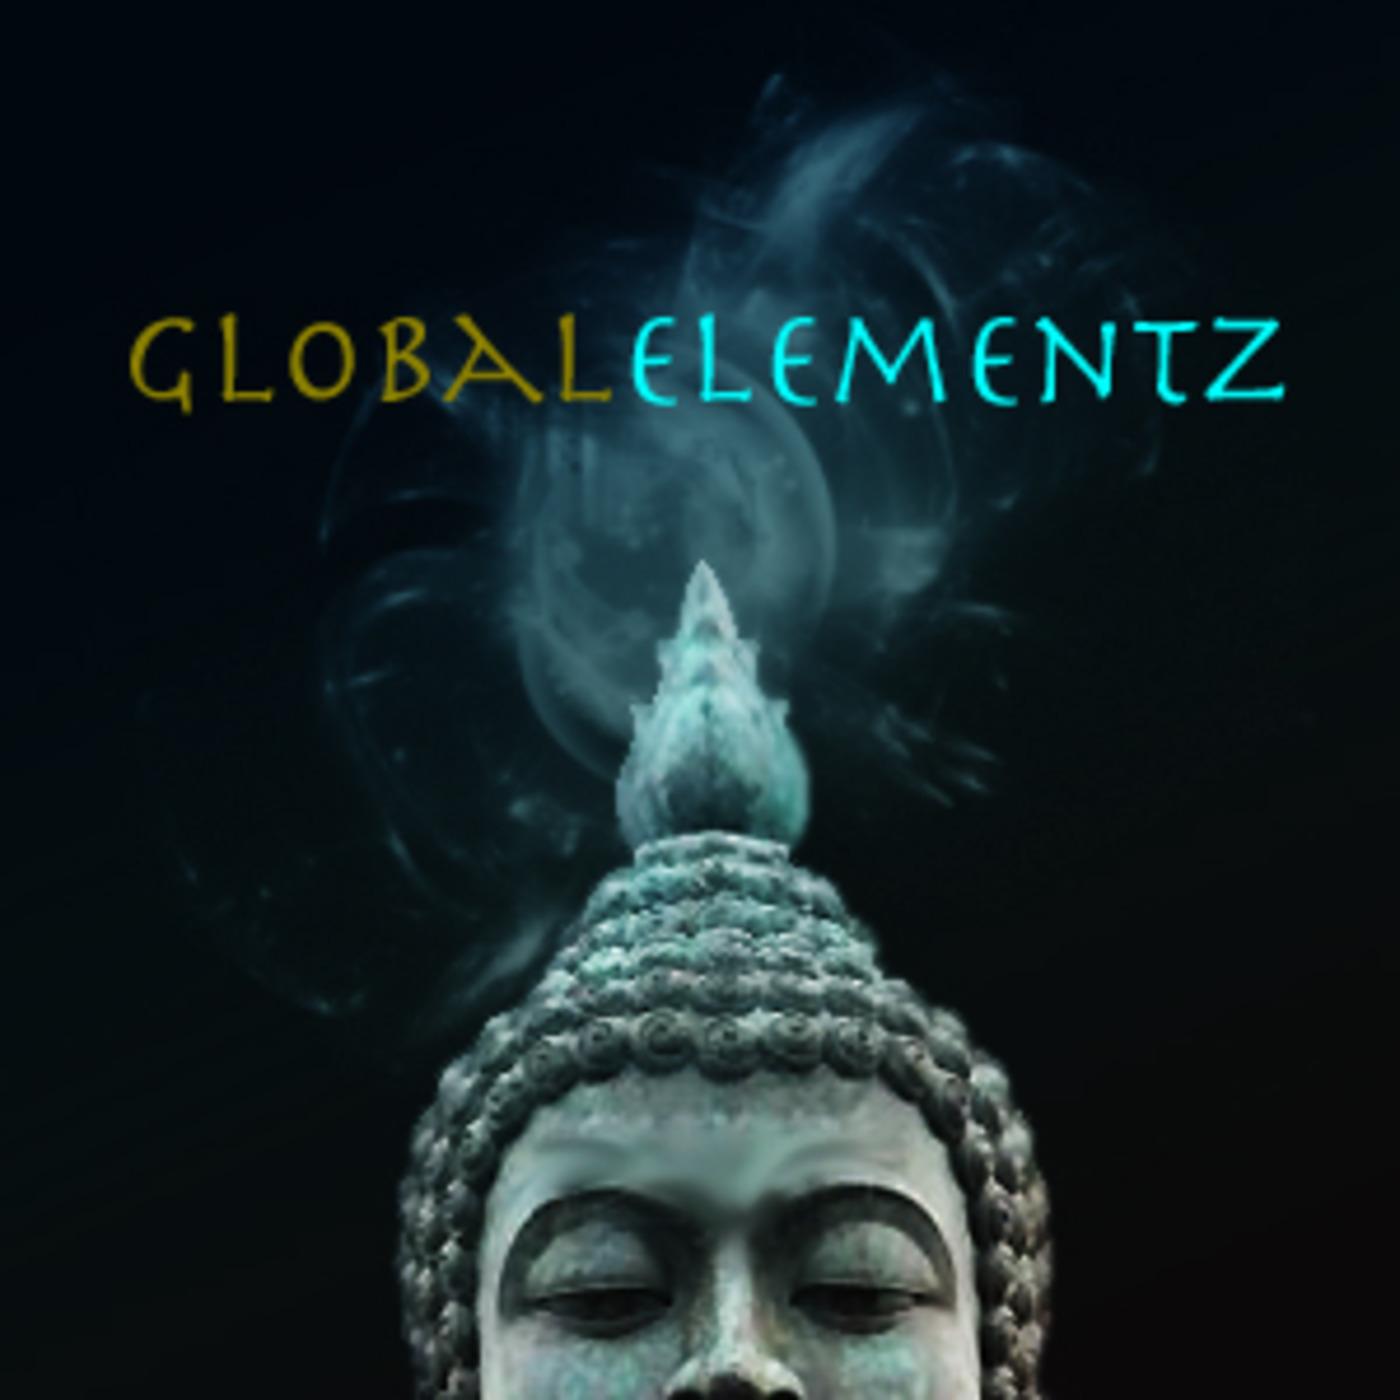 GlobalElementz